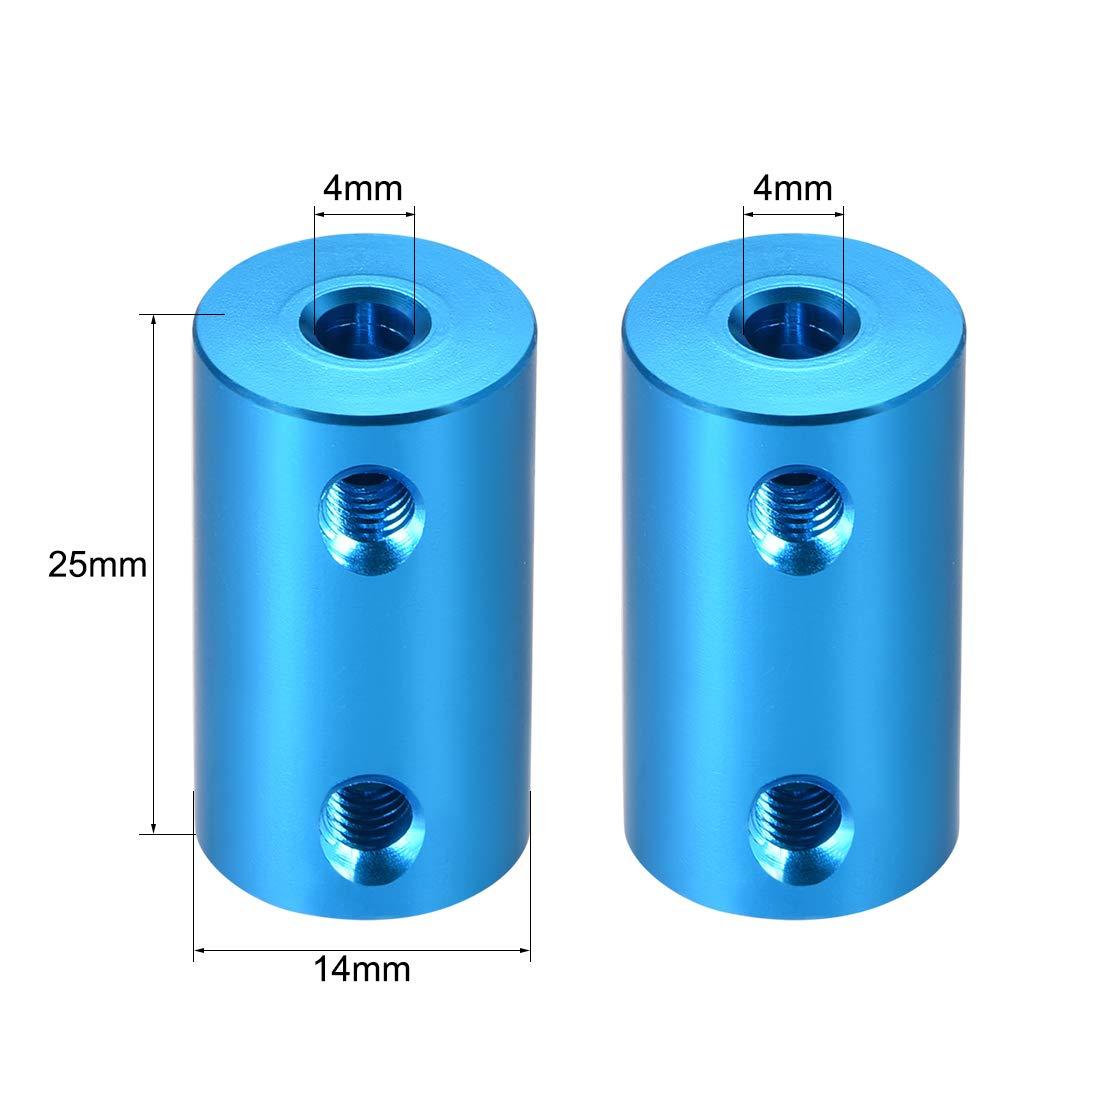 sourcing map Welle Kupplung Roboter Rad Koppler Blau 10mm zu 10mm Bohrung L25xD16